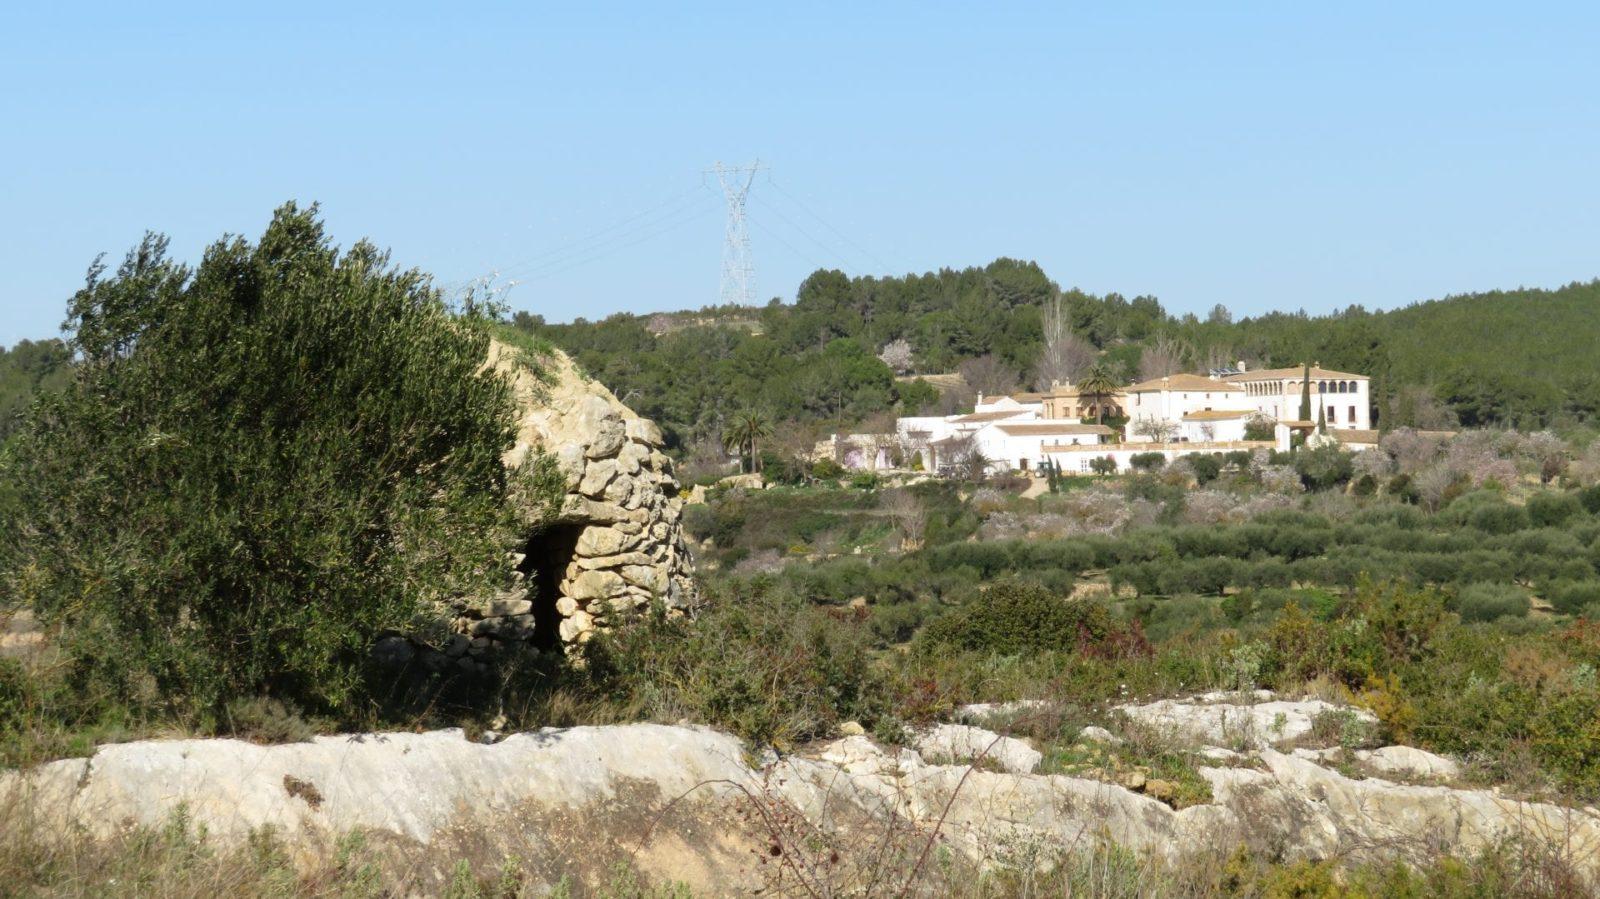 La hermosa masia de Can Ràfols